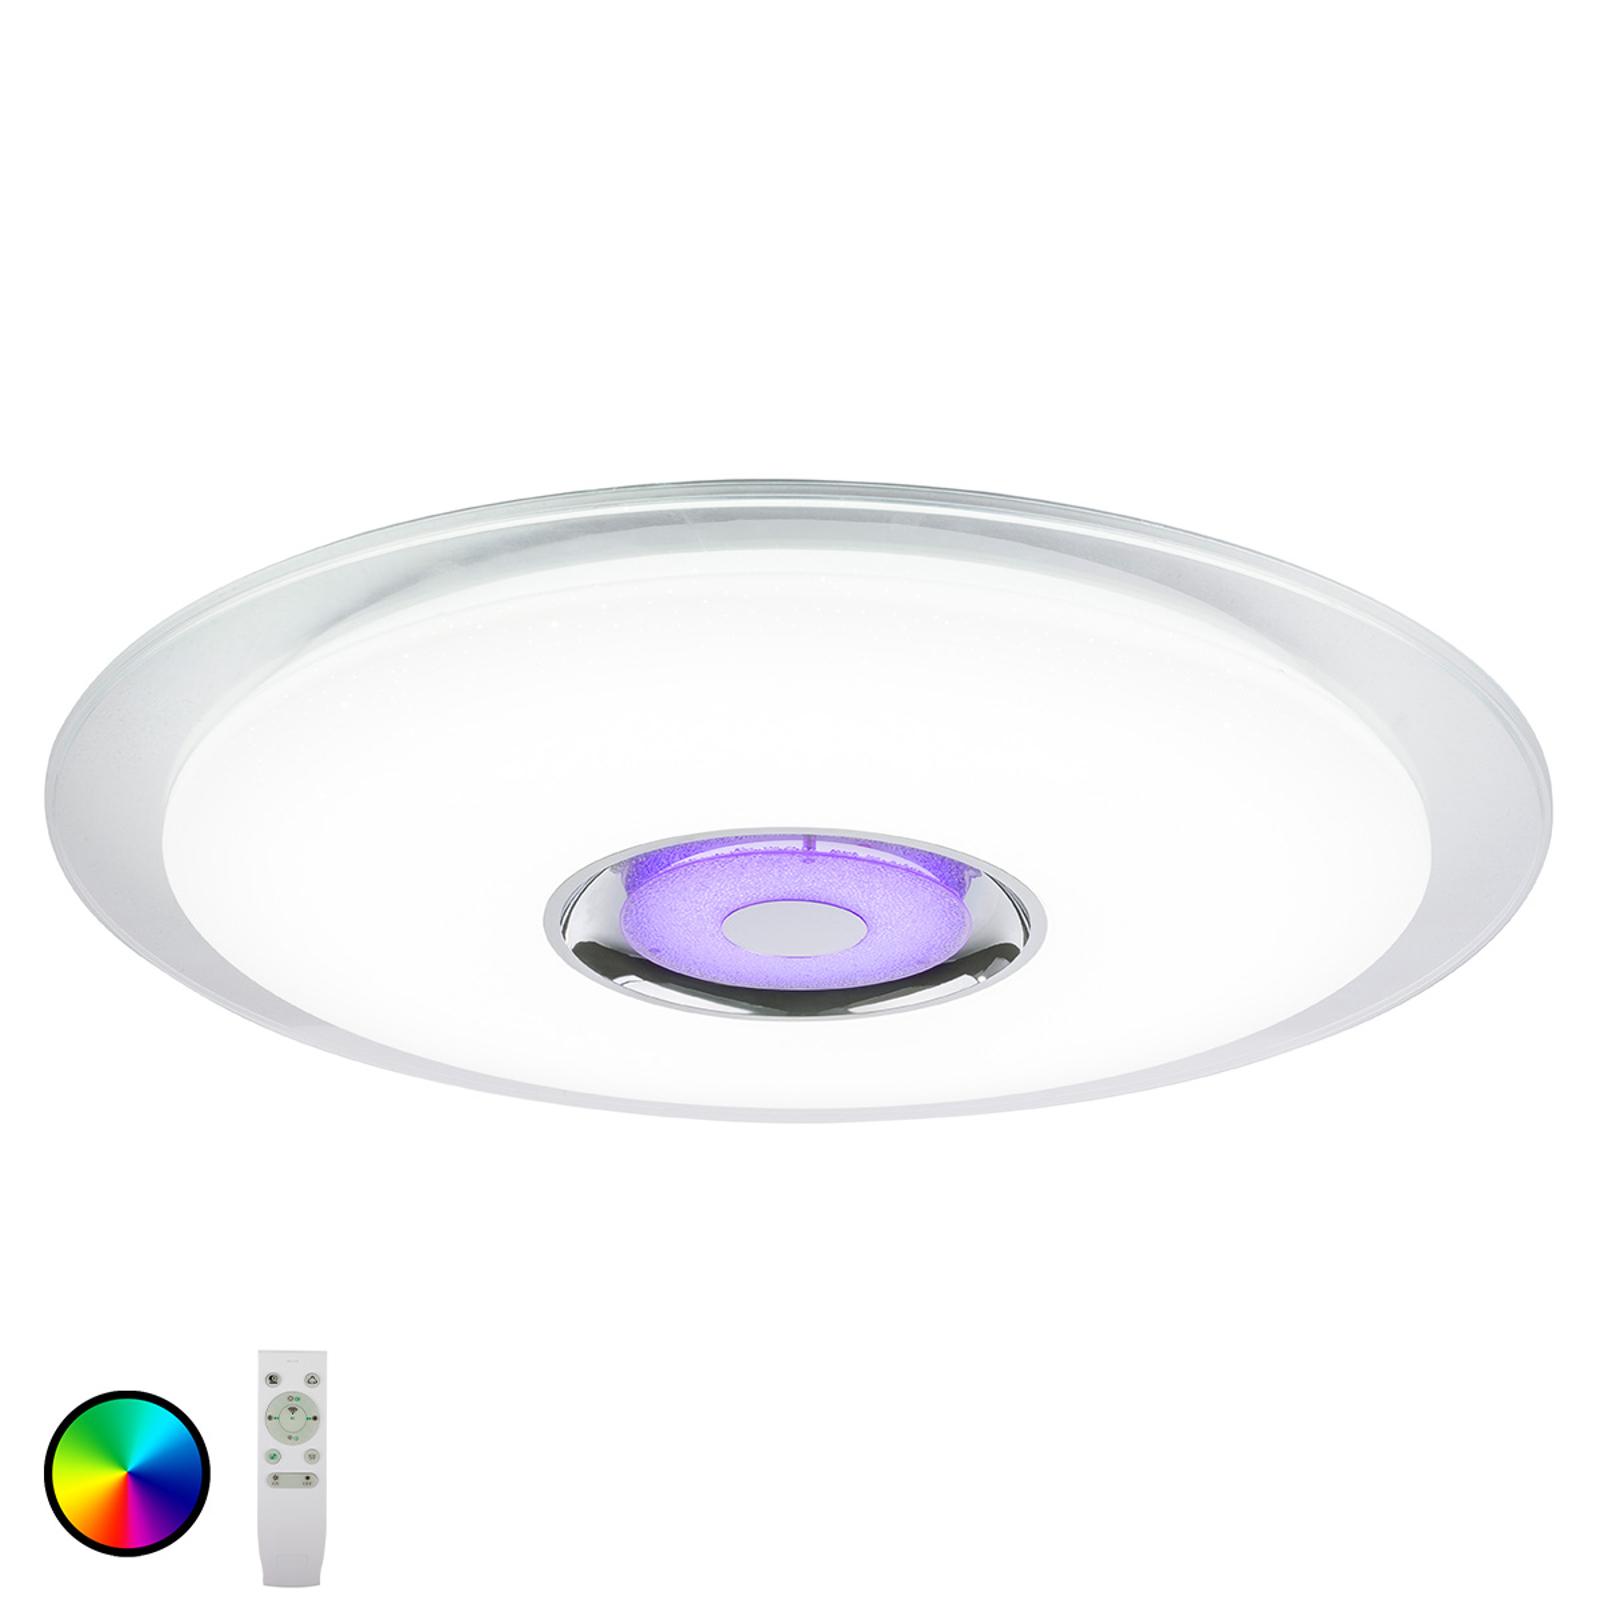 LED plafondlamp Tune RGB met luidspreker Ø 60